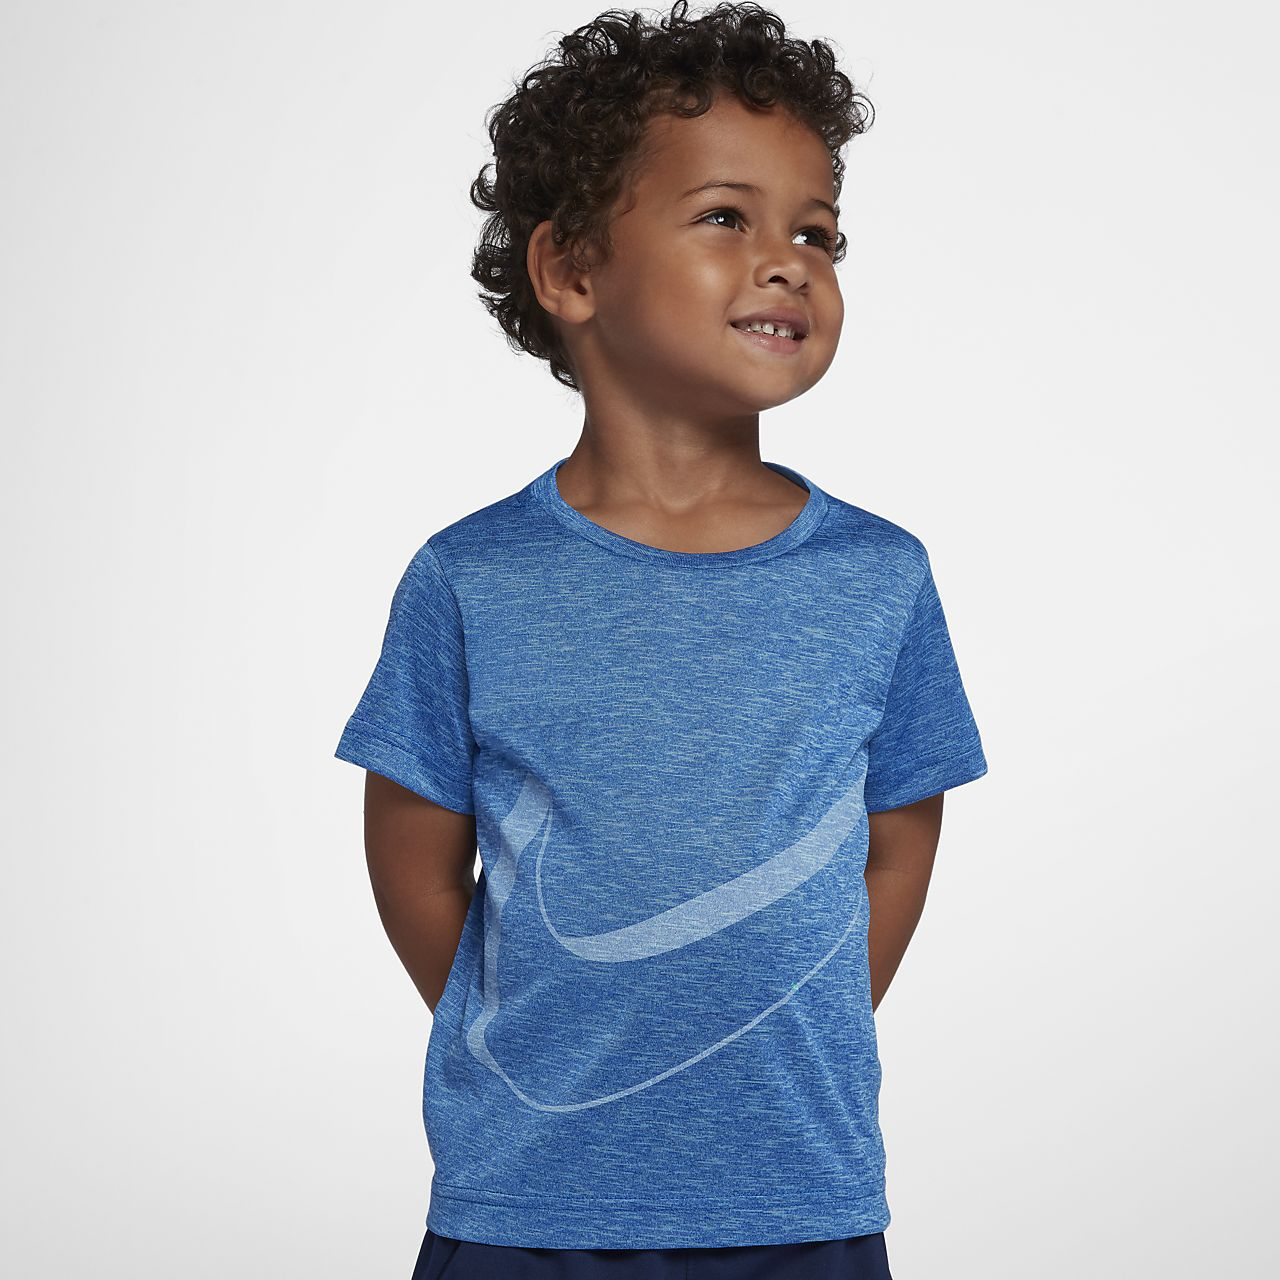 Nike Breathe póló gyerekeknek